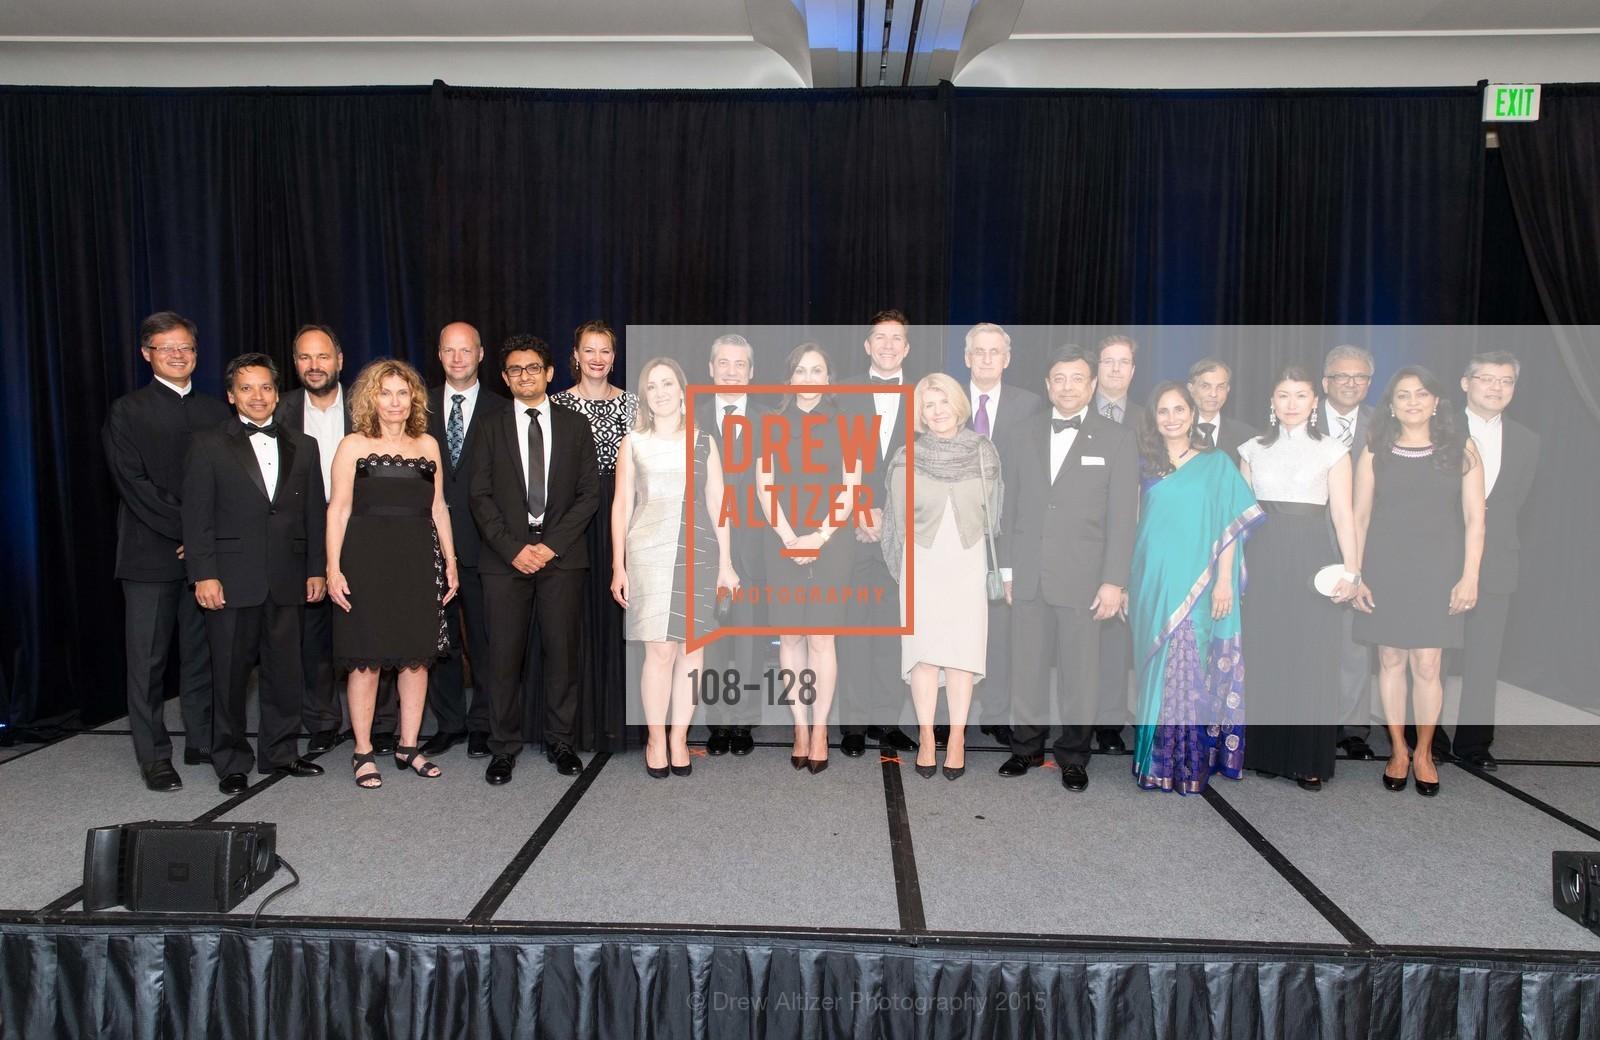 Jay Xu, Lata Krishnan, Umang Gupta, Vivek Ranadive, Padmasree Warrior, Matias Tarnopolsky, S. Shariq Yosufzai, Ruediger Naumann-Etienne, Annette Campbell-White, Gary Kovac, Bita Daryabari, Nicola Luisotti, Noosheen Hashemi, Petra Dierkes-Thrun, Wael Ghonim, Sebastian Thrun, Sharon Chabon, Paul Maritz, Deepak Srivastava, Jerry Yang, World Affairs Council Awards Dinner: Global Actors | Global Reach | Global Impact, Four Seasons San Francisco, May 25th, 2015,Drew Altizer, Drew Altizer Photography, full-service agency, private events, San Francisco photographer, photographer california